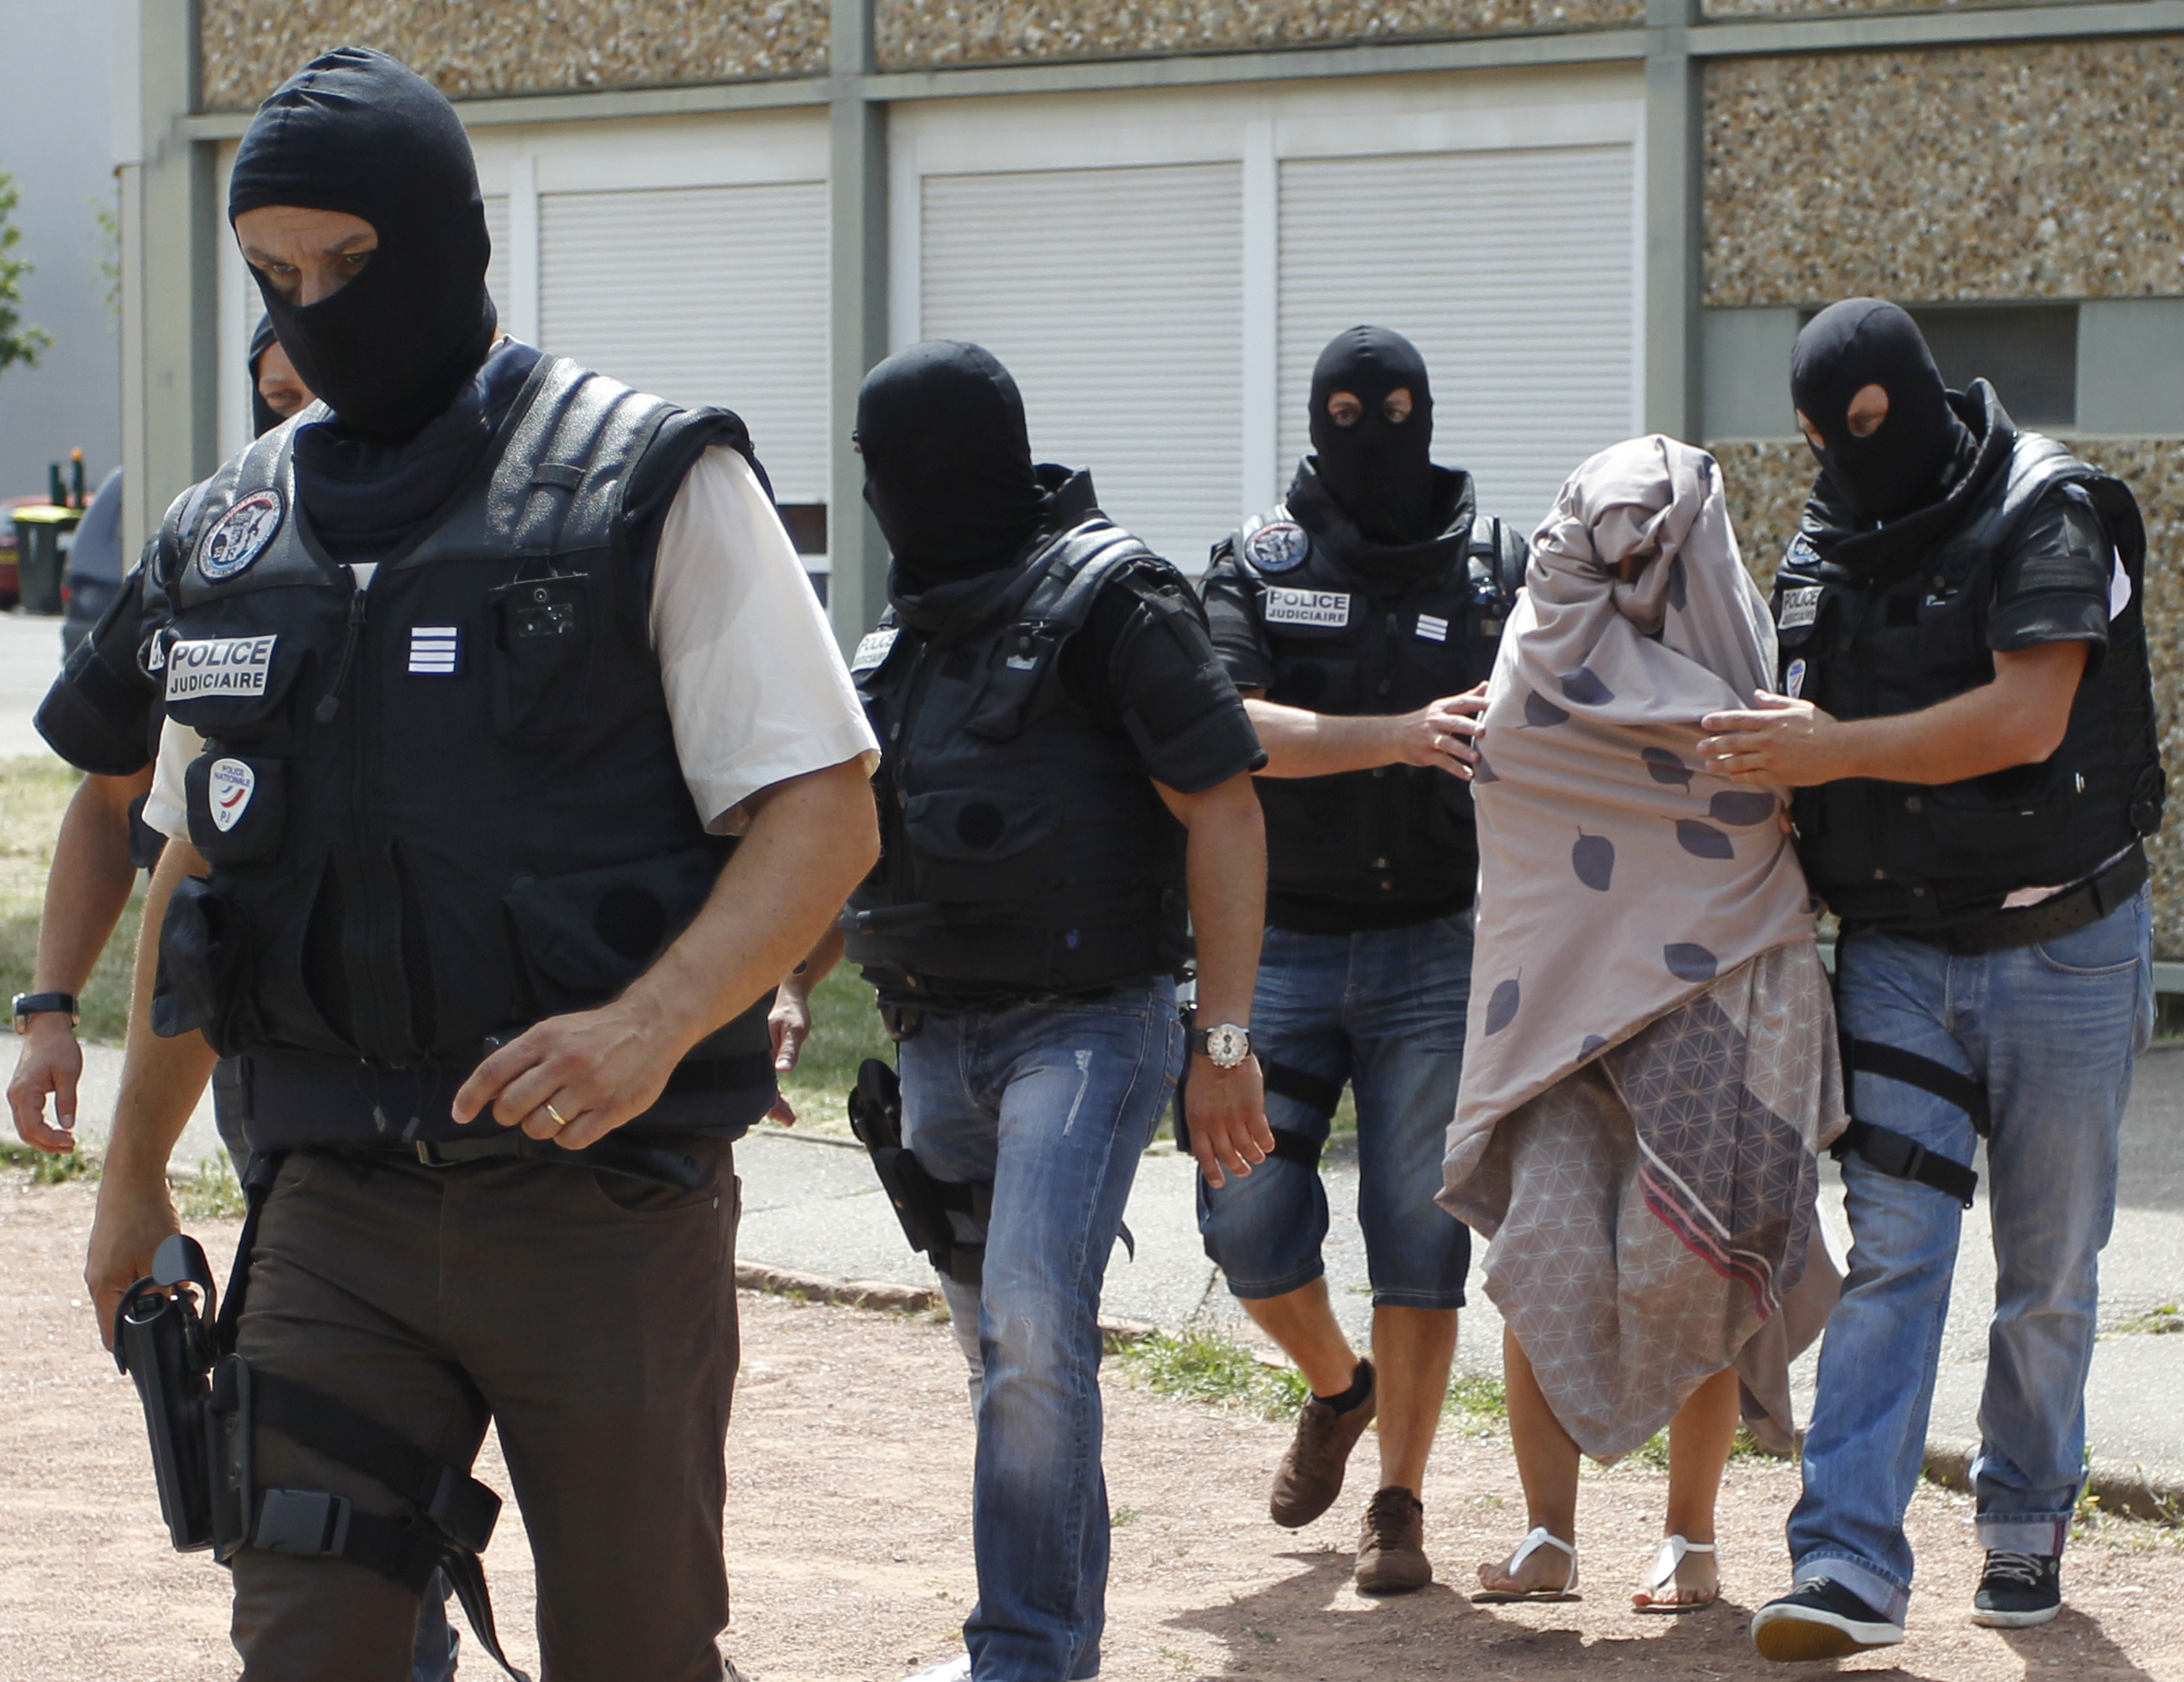 Terrorist Photo: Man Decapitated In France Terror Attack